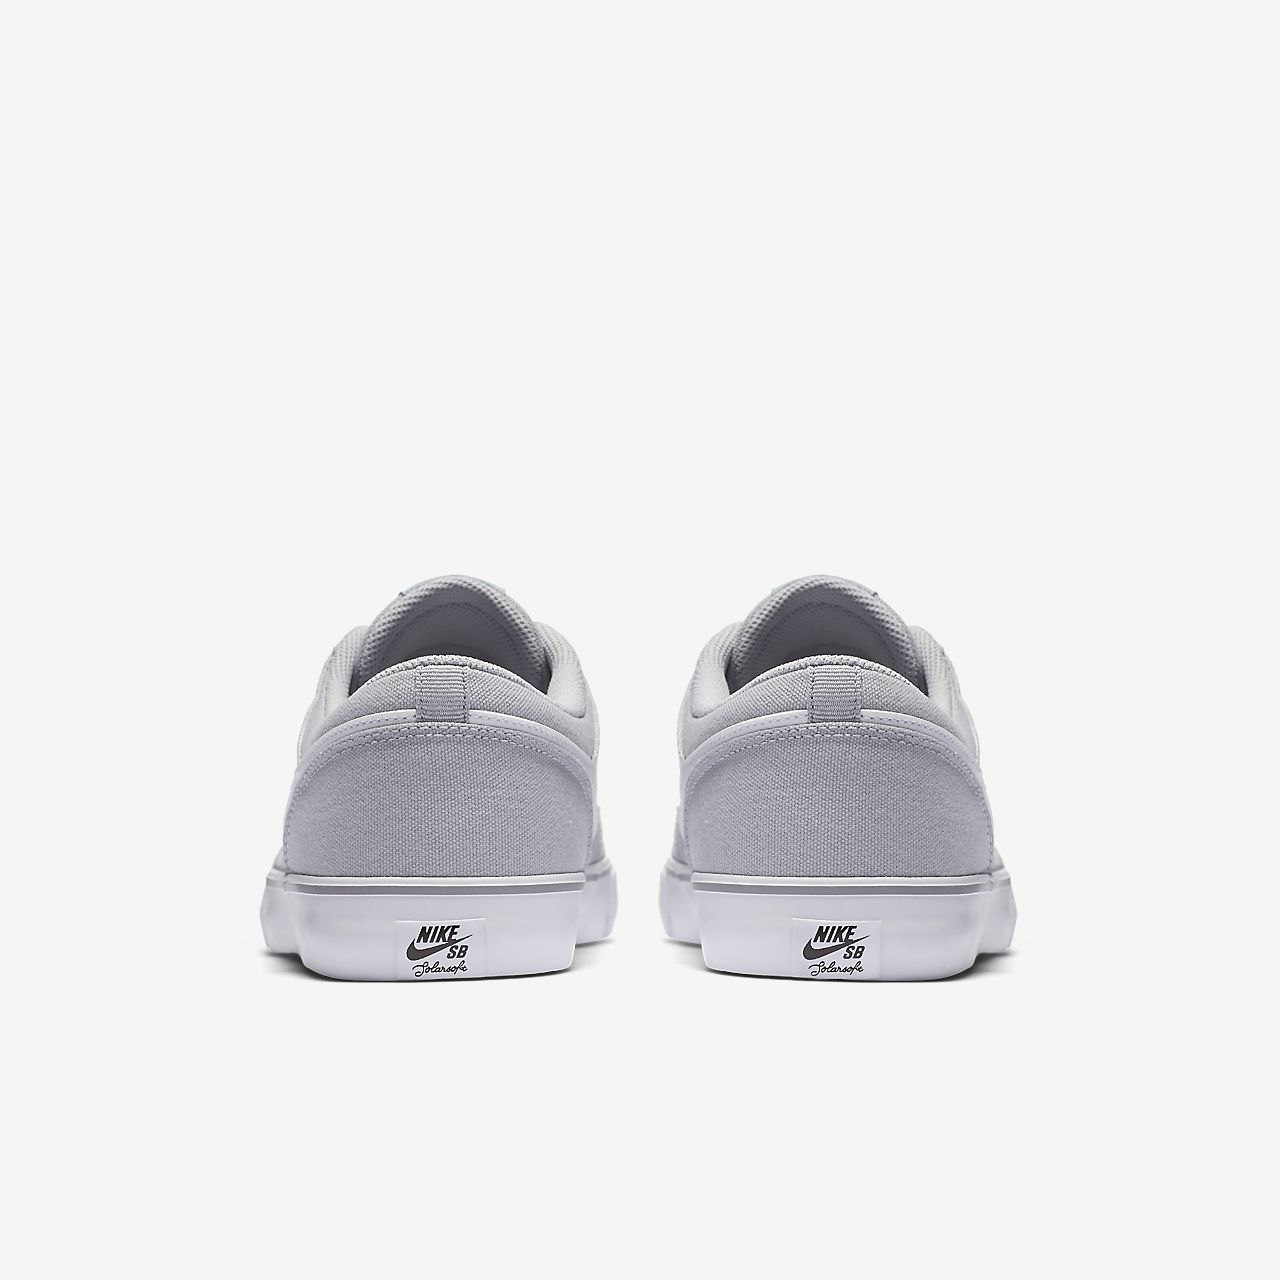 buy popular d9c5b c01a8 ... Nike SB Solarsoft Portmore 2 Skate Shoe